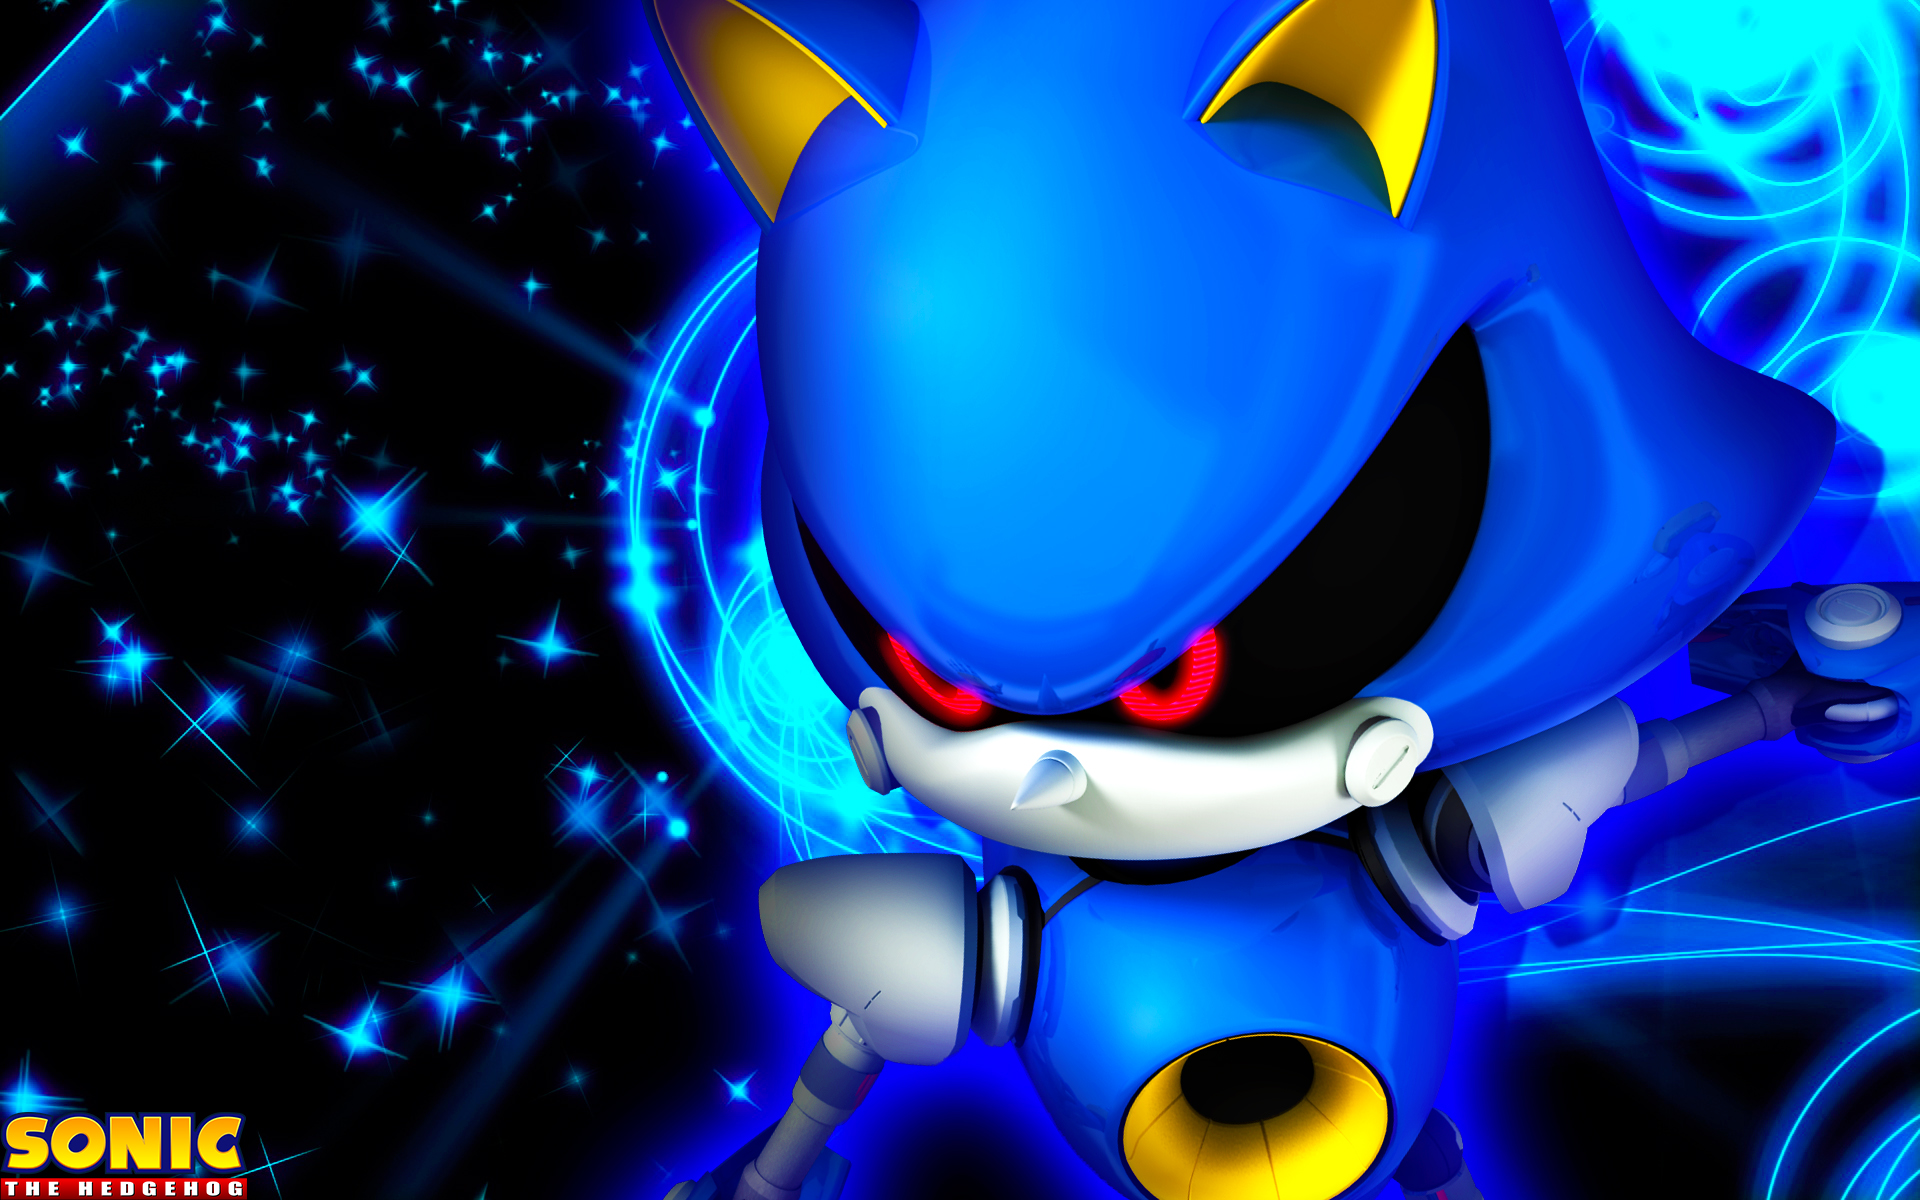 Metal Sonic Wallpaper By Sonicthehedgehogbg On Deviantart